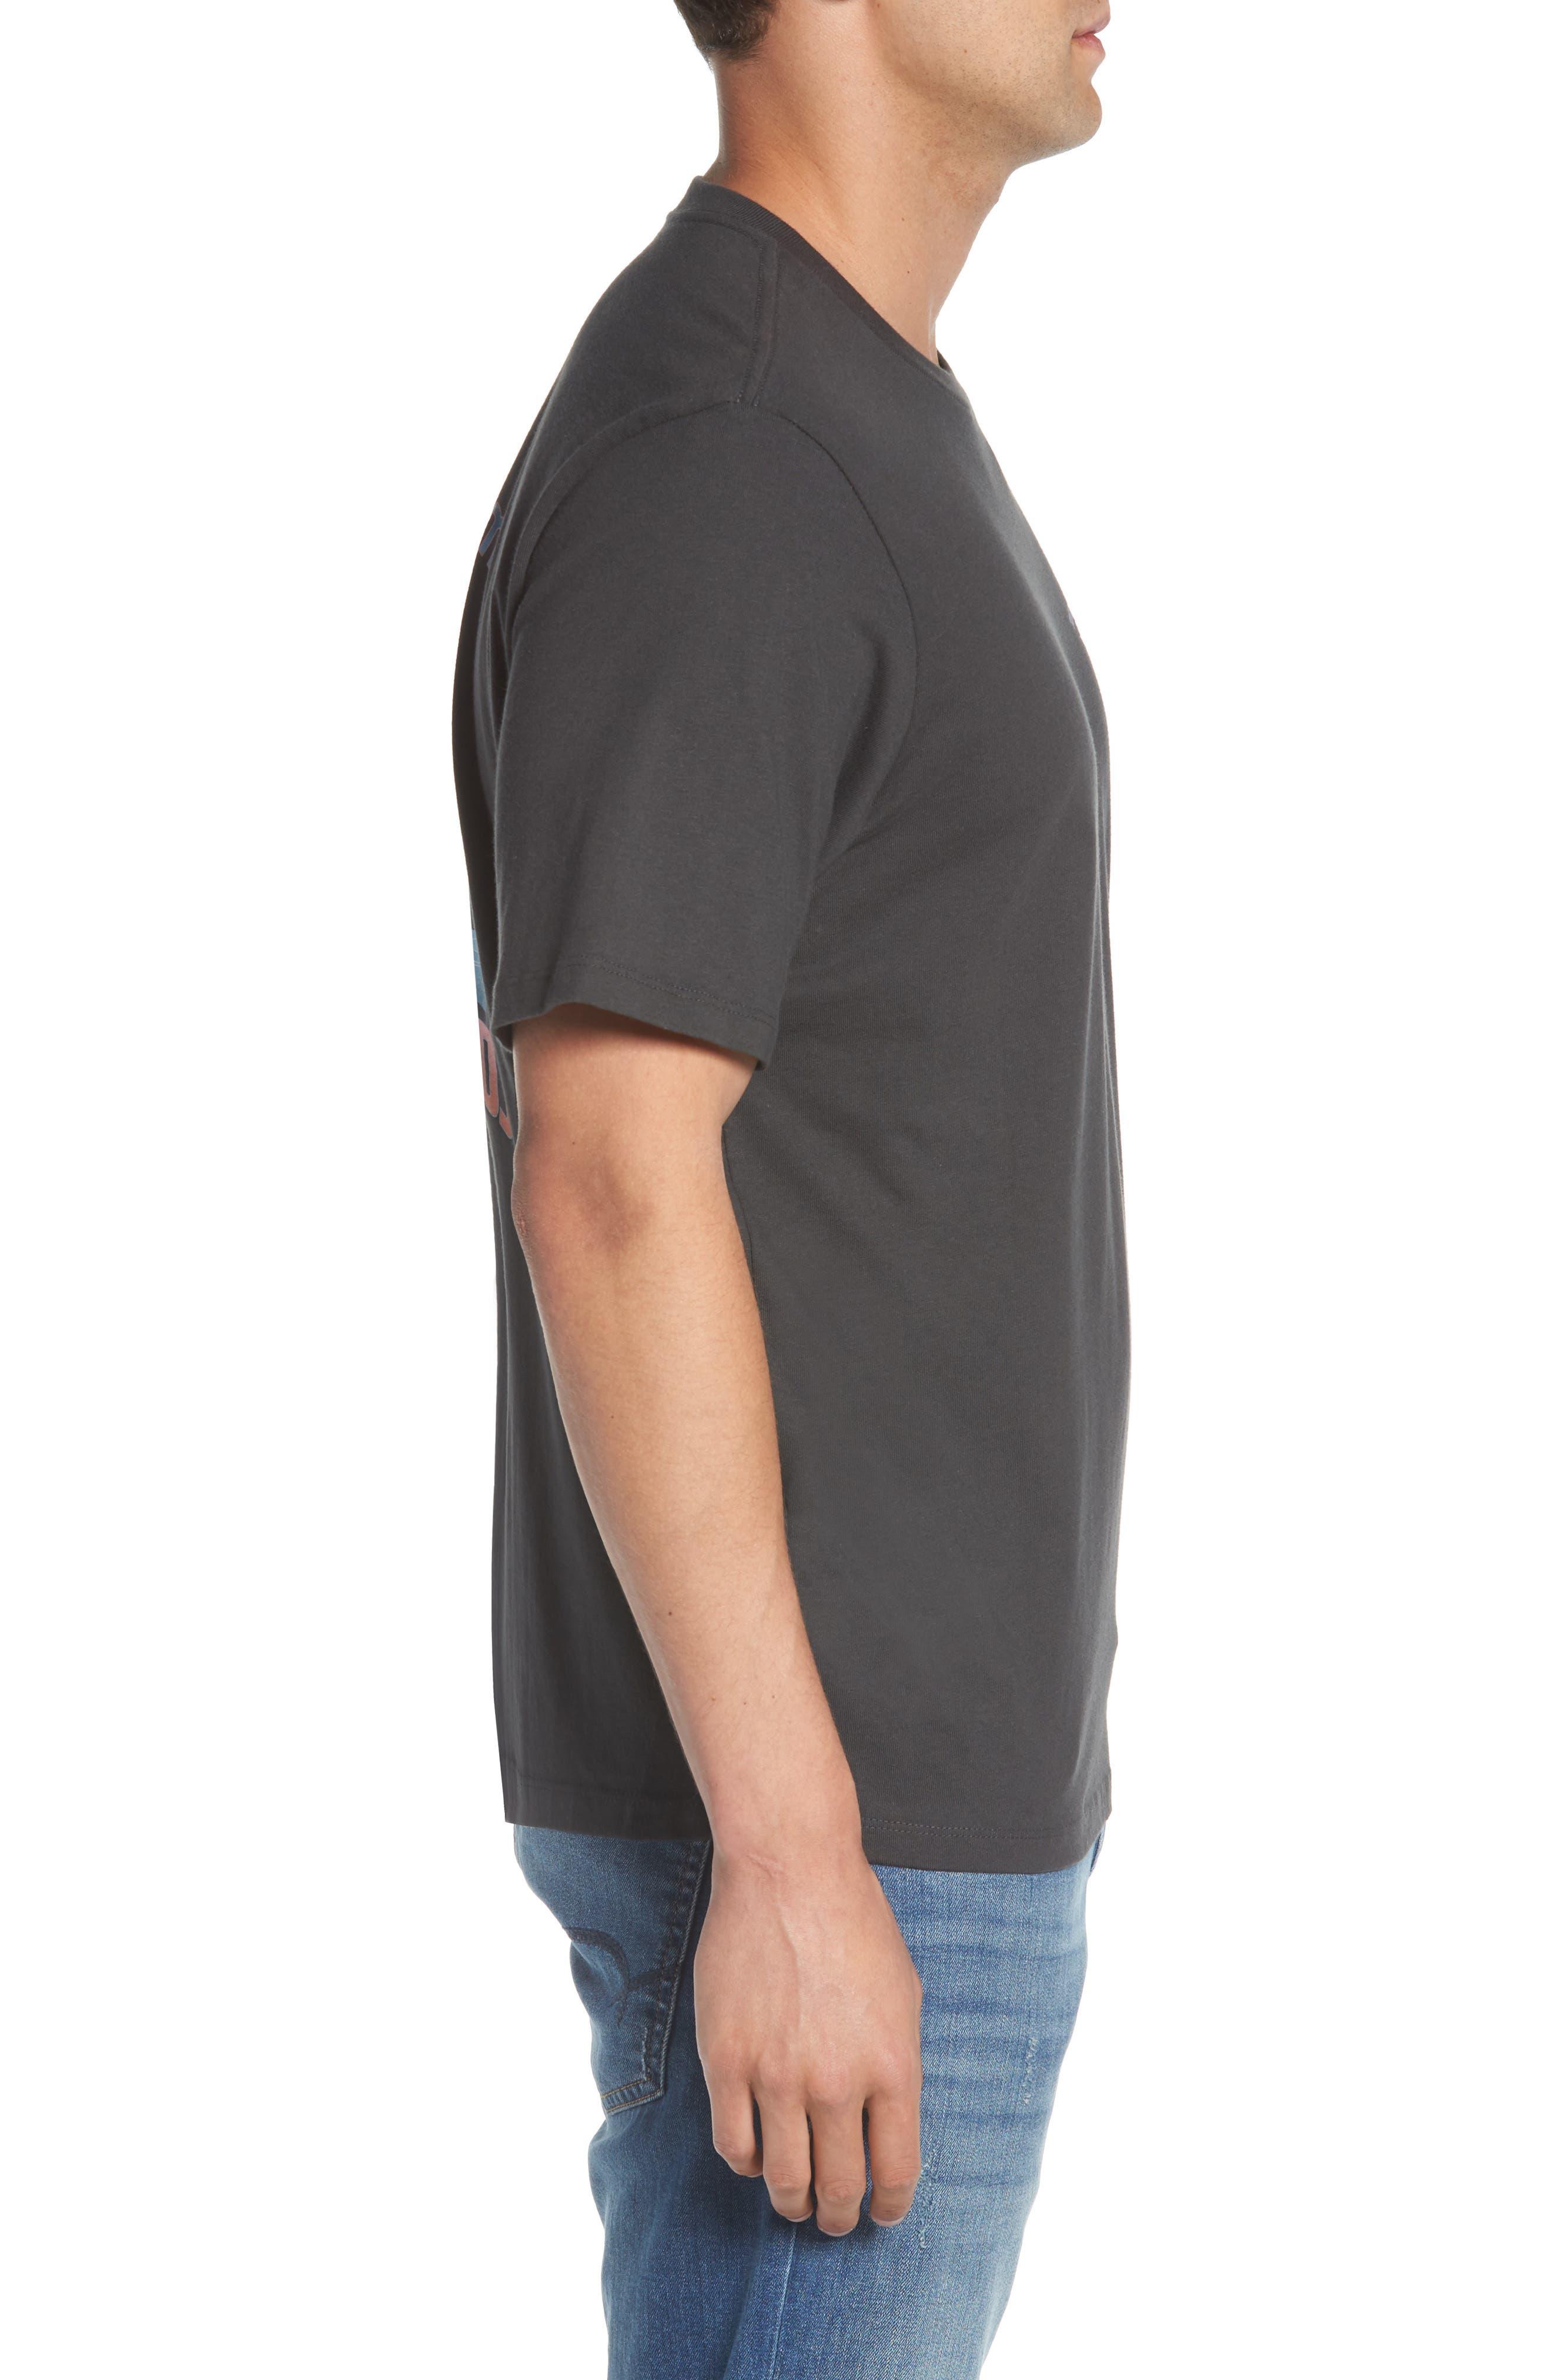 Bromingos T-Shirt,                             Alternate thumbnail 3, color,                             Coal